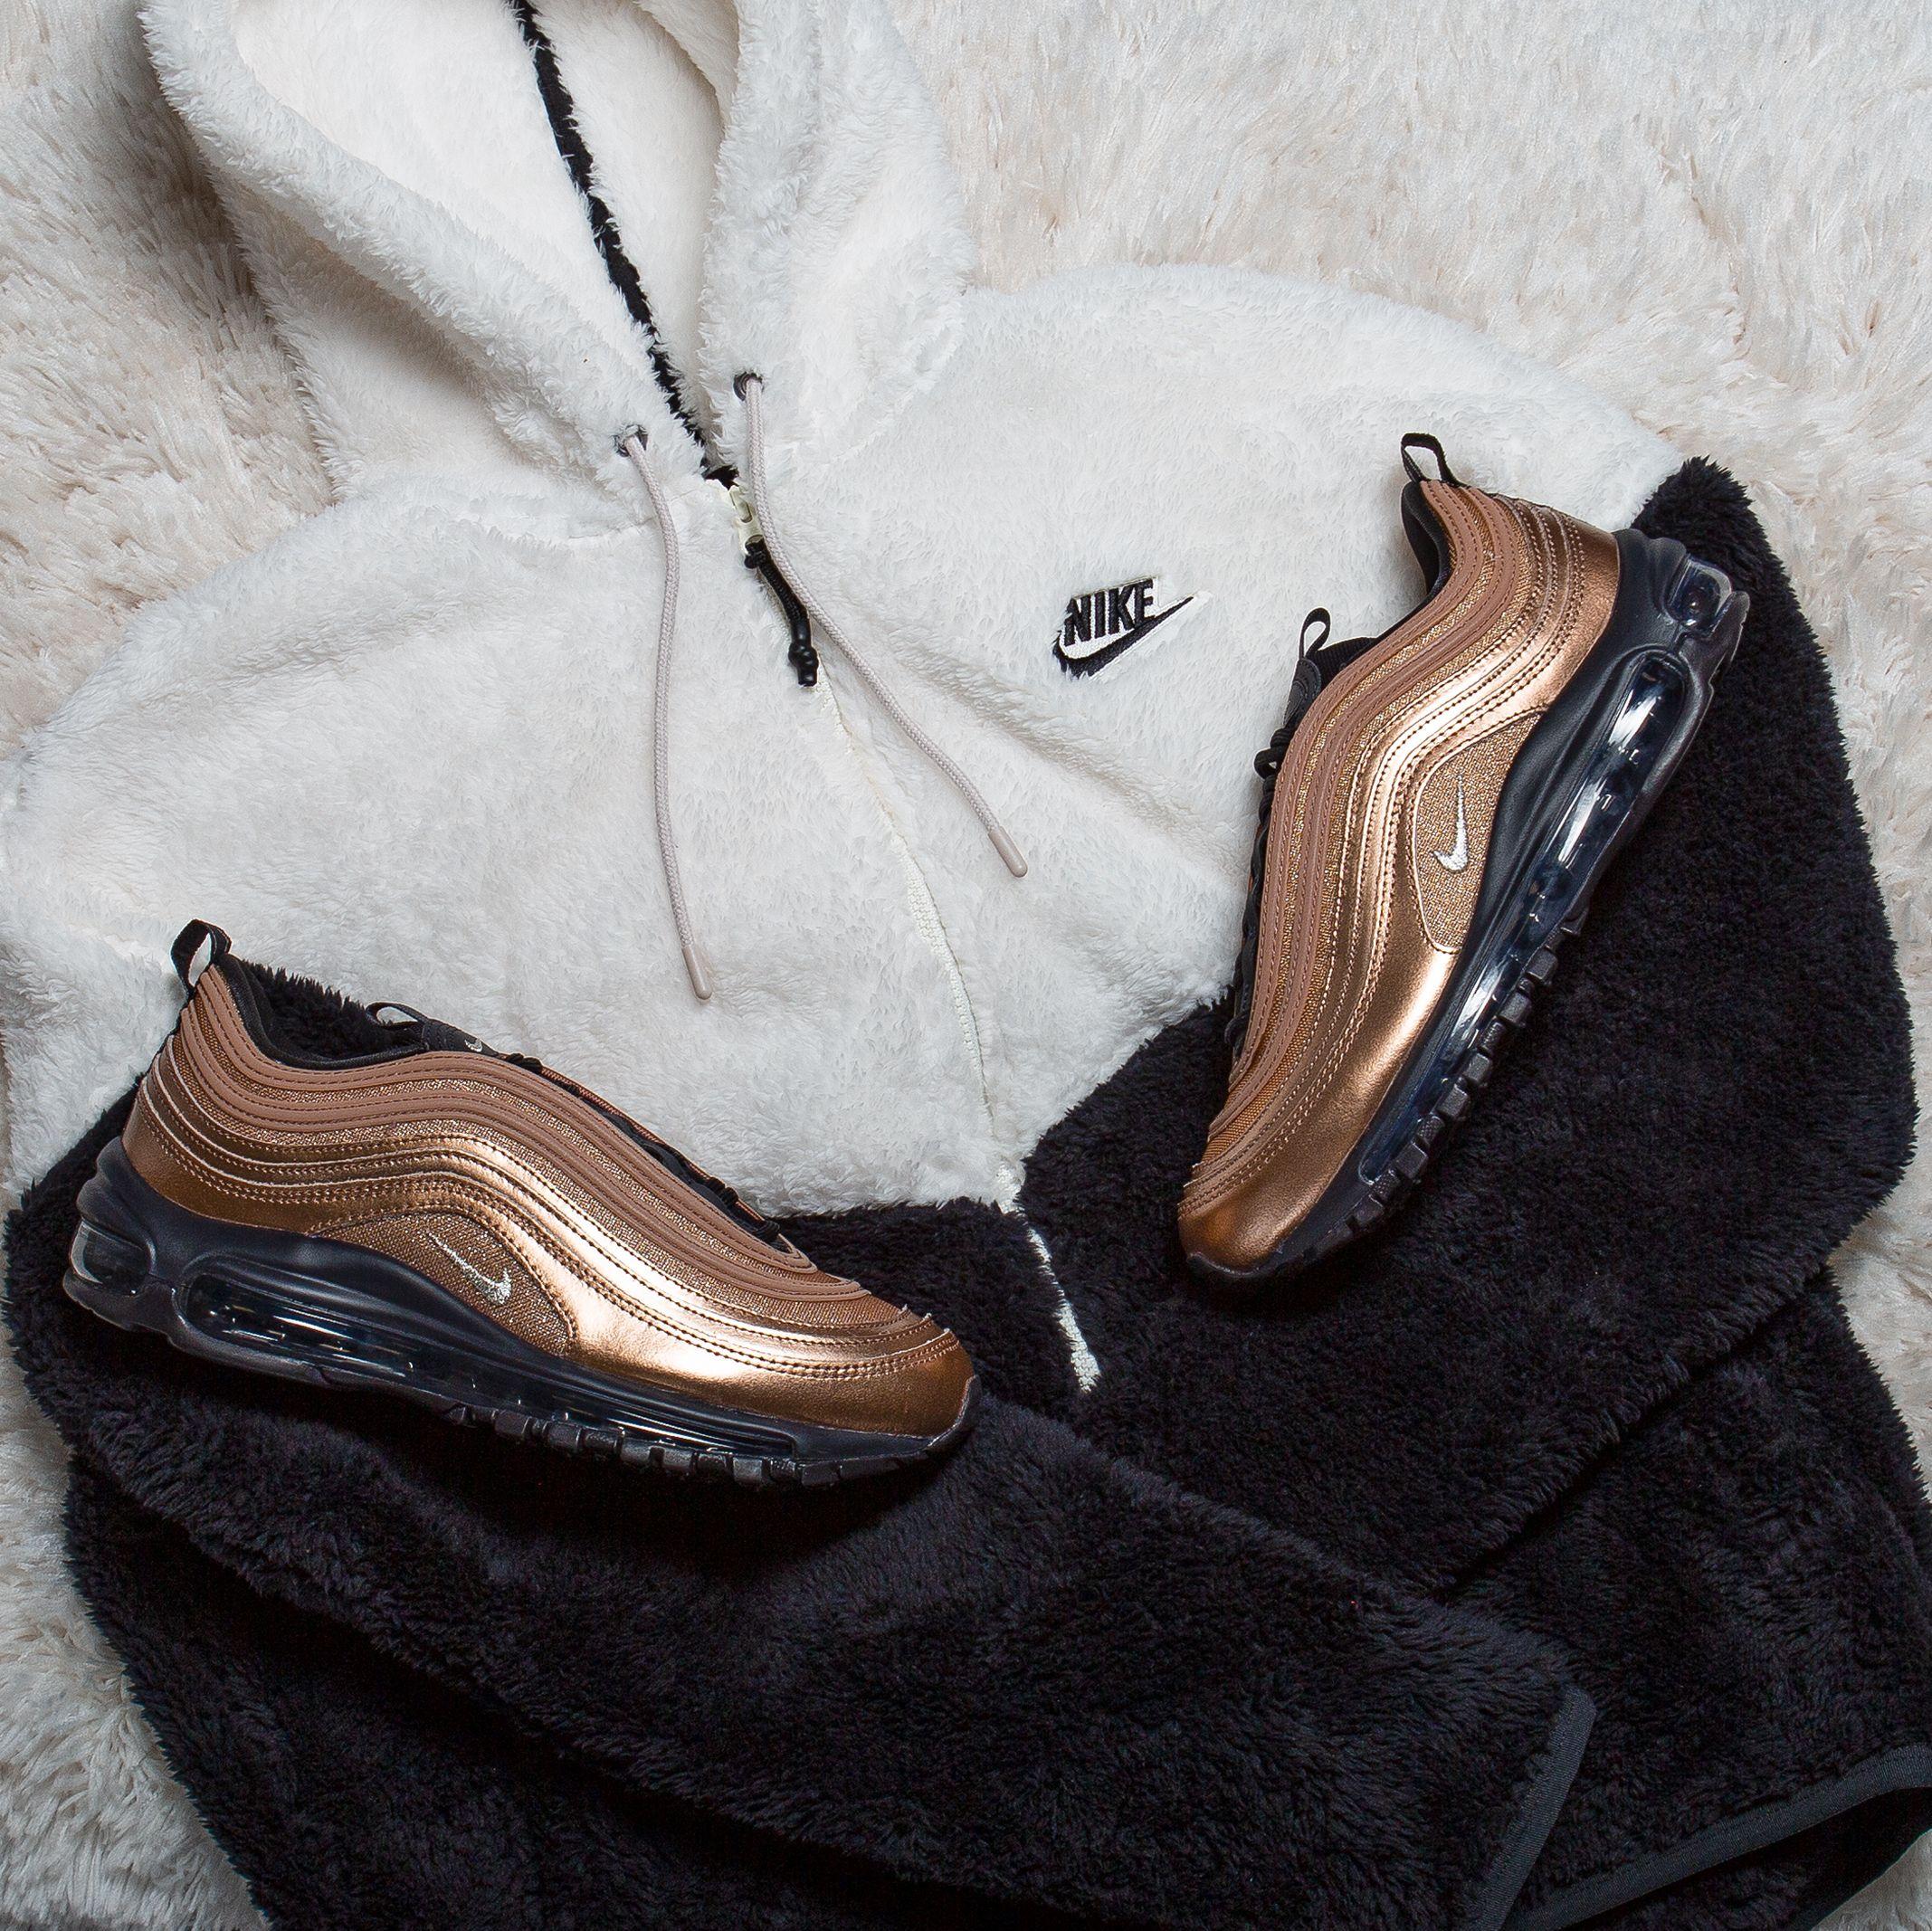 Pin by Darian Rucker on Shoes Nike air max 97, Nike air